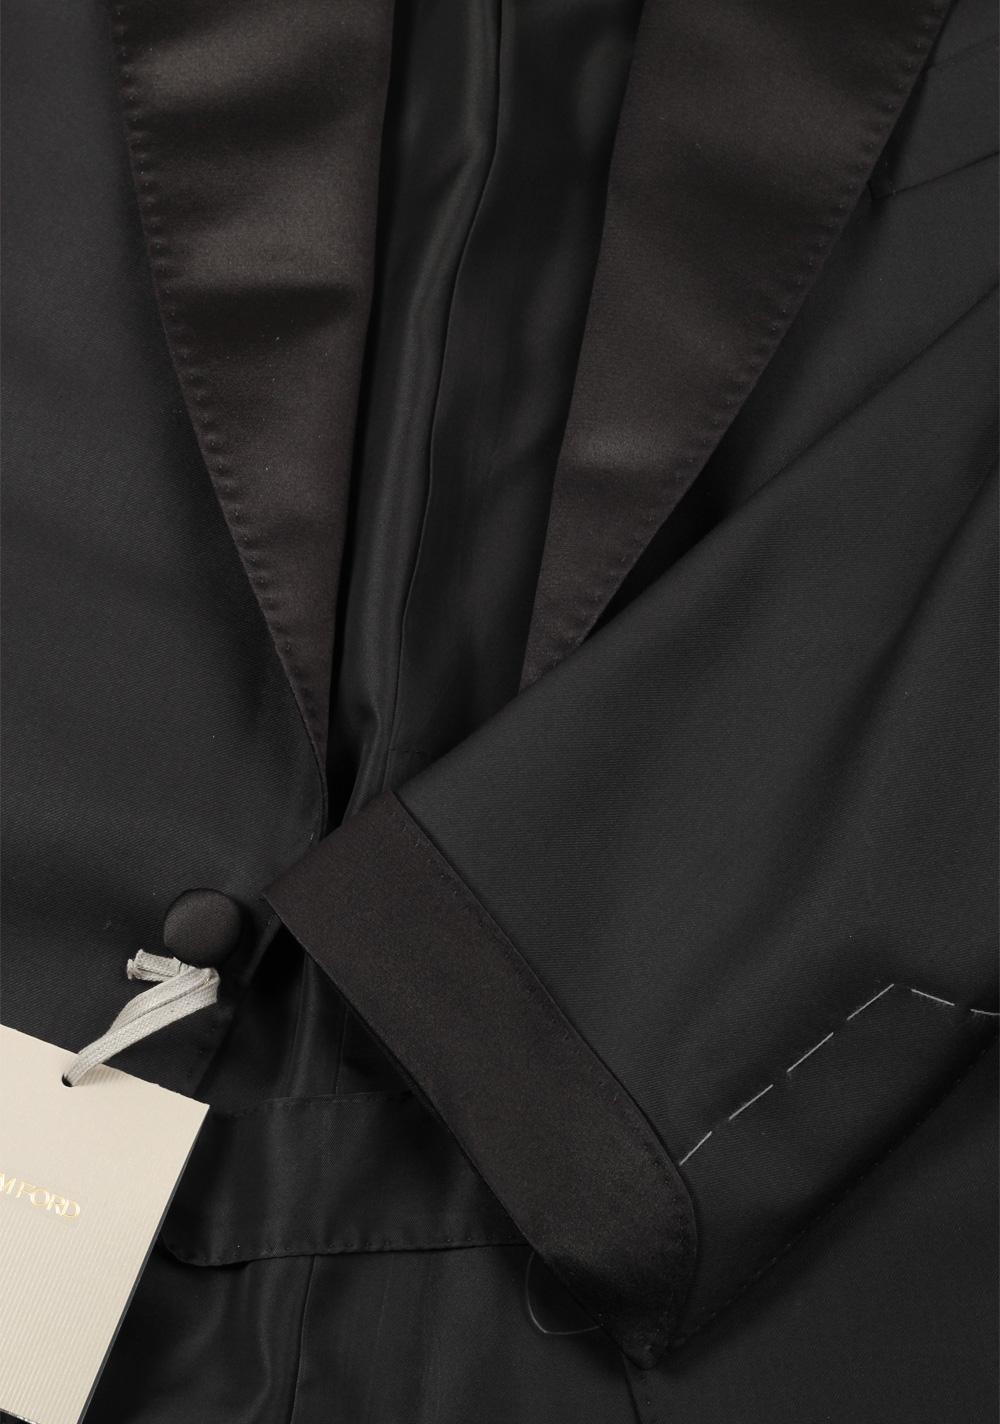 TOM FORD Shelton Black Tuxedo Dinner Suit Size 60 / 50R U.S. | Costume Limité